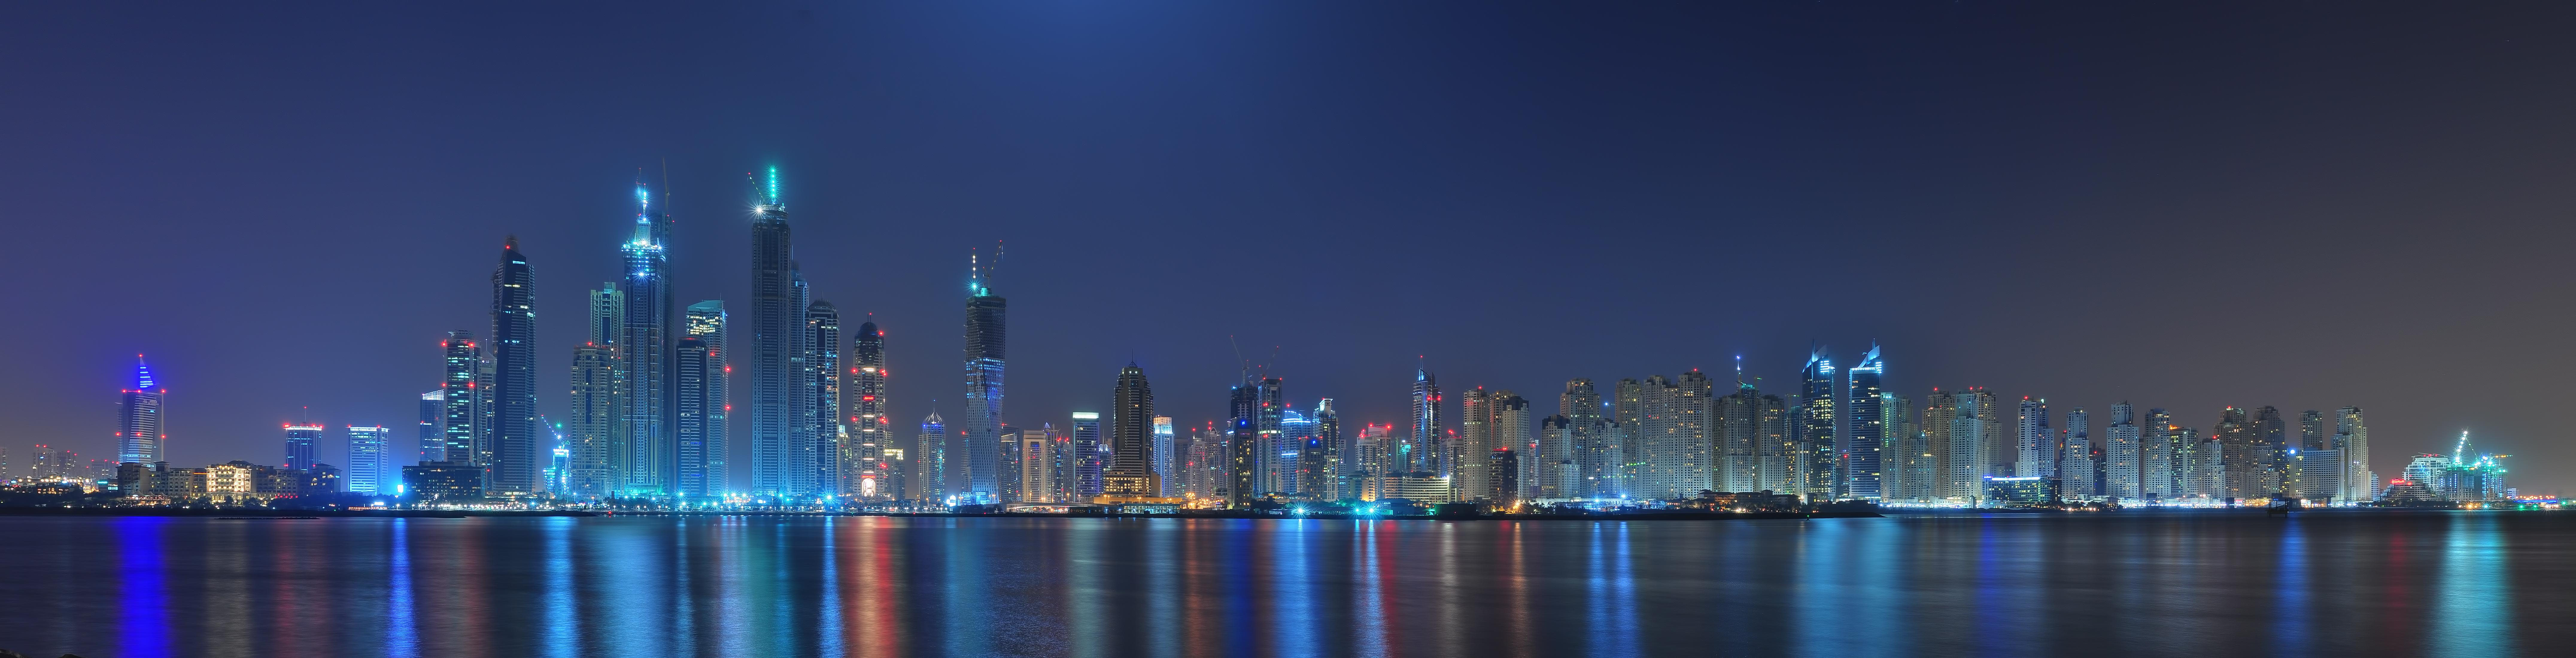 Night Sky Clouds City